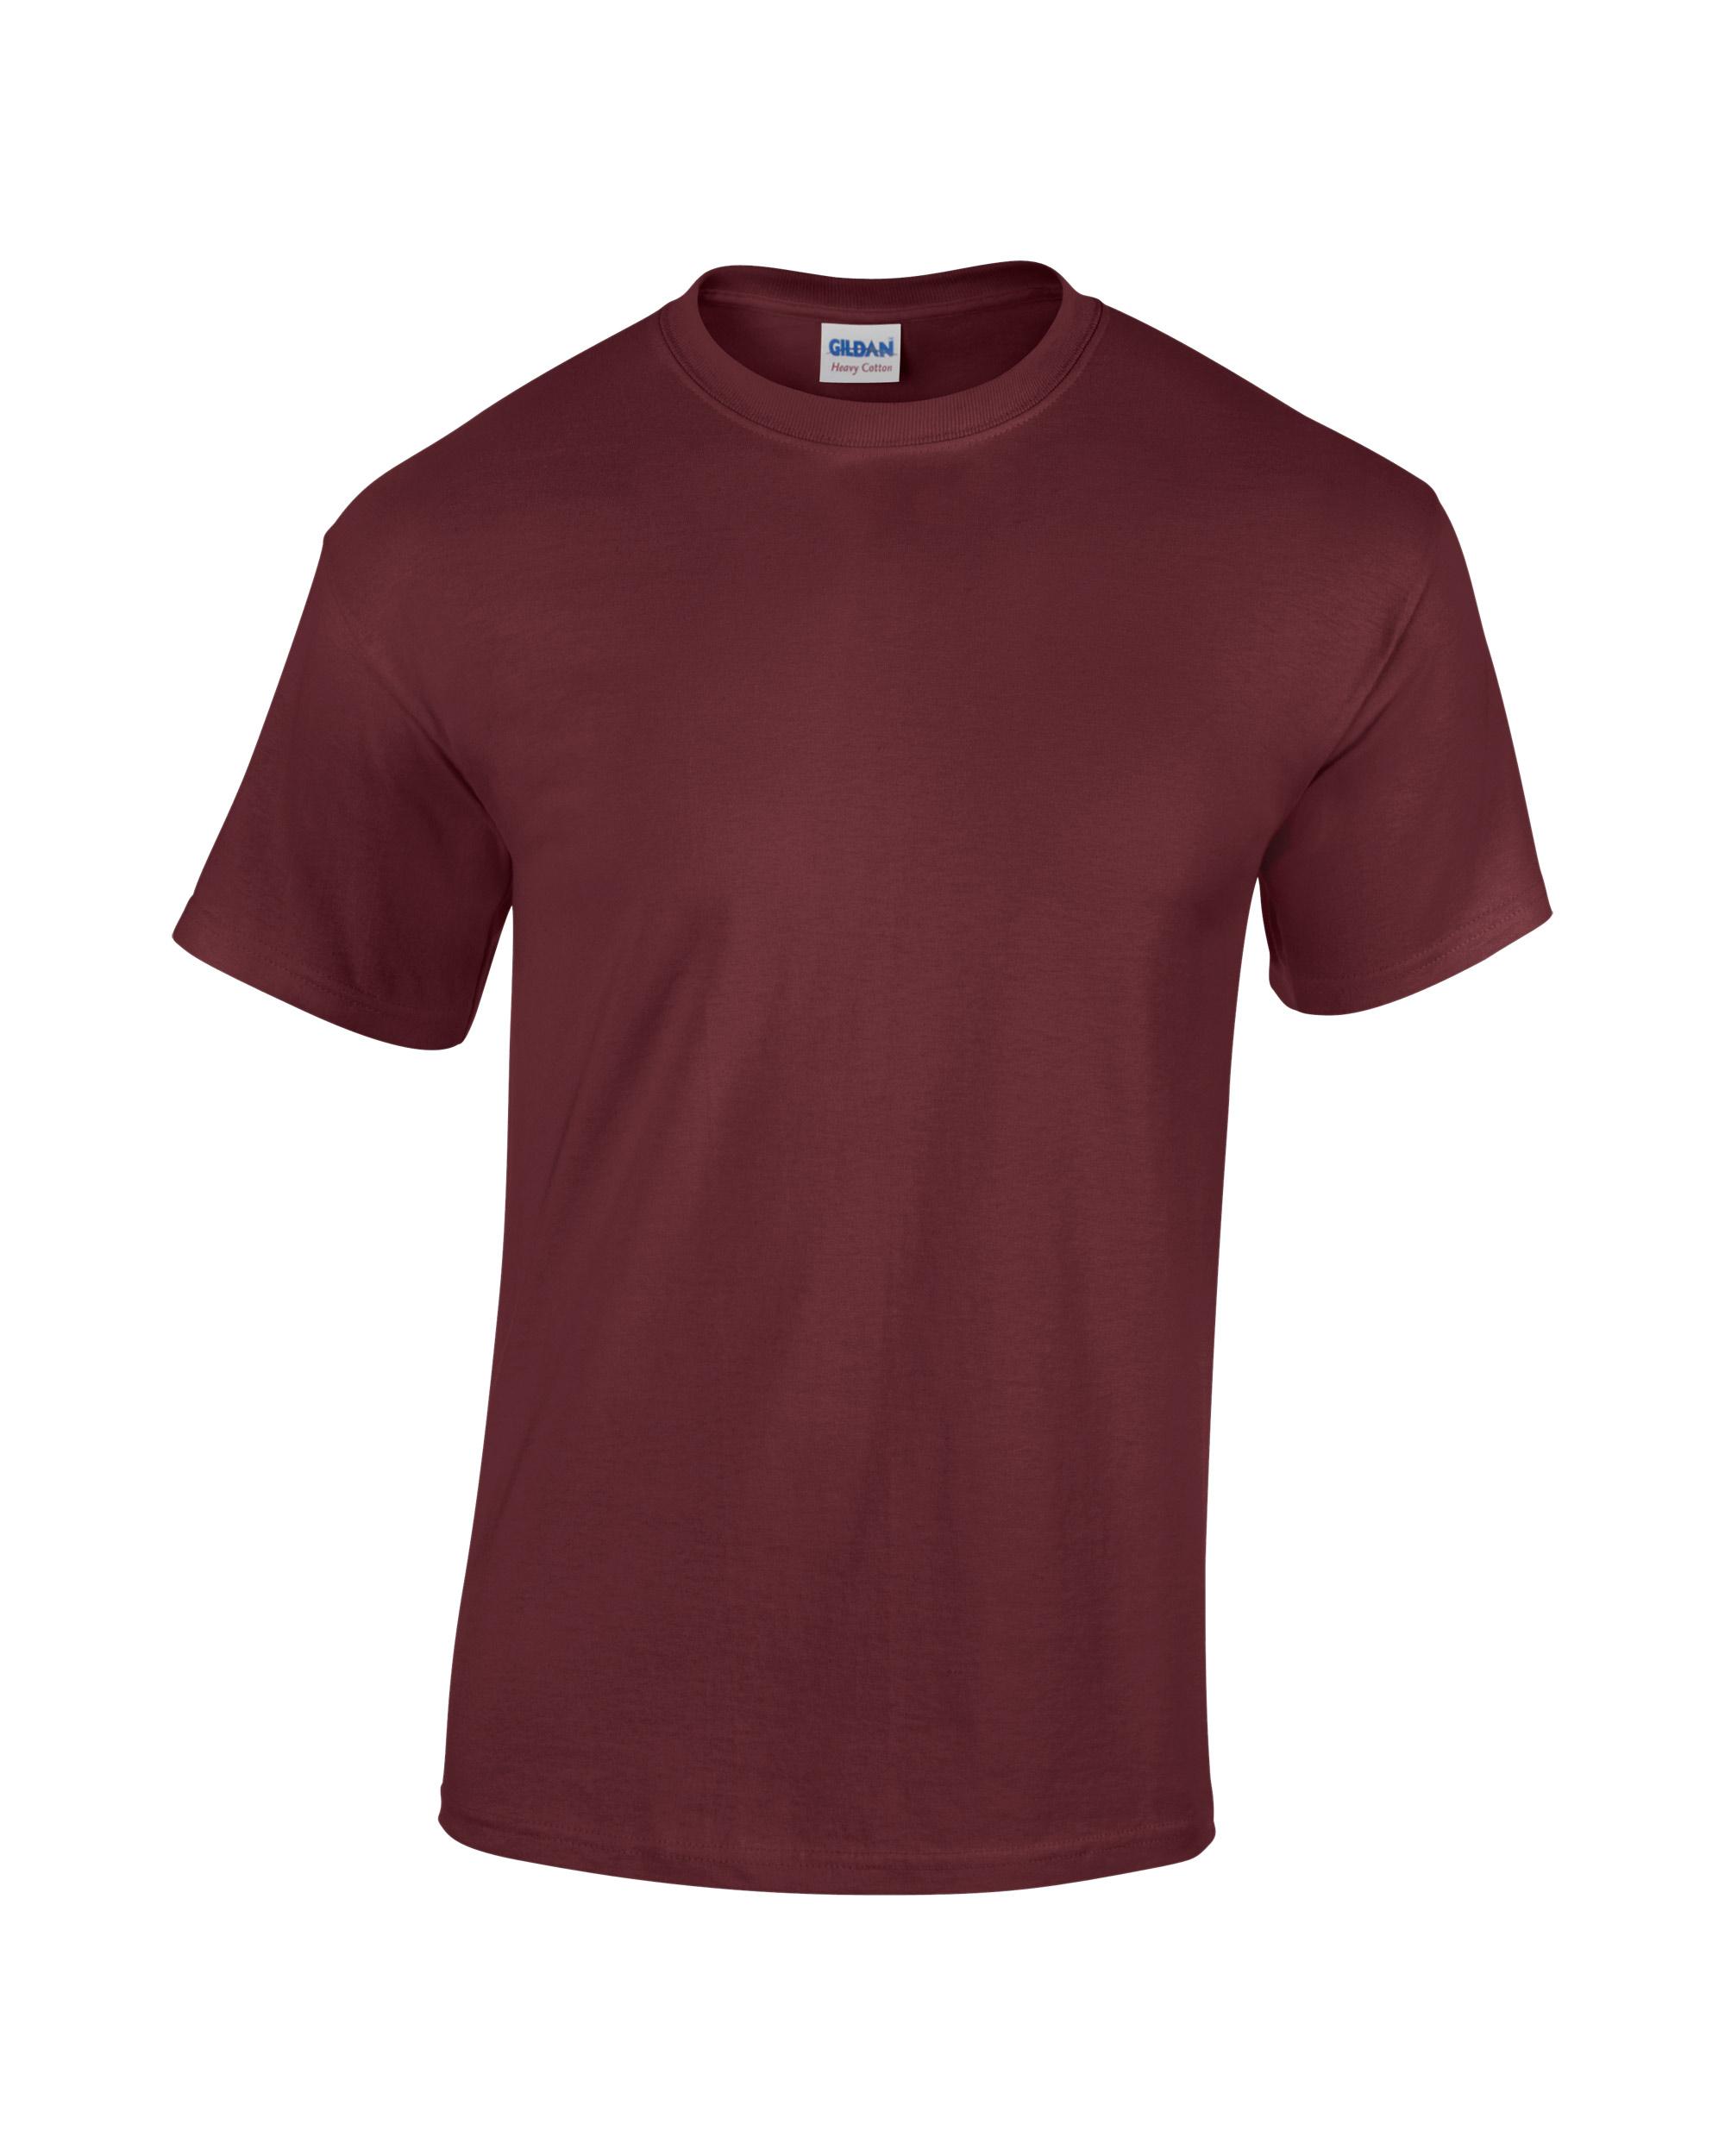 Unisex Gildan Heavy Cotton 53 Oz Tshirt Team Shirt Pros